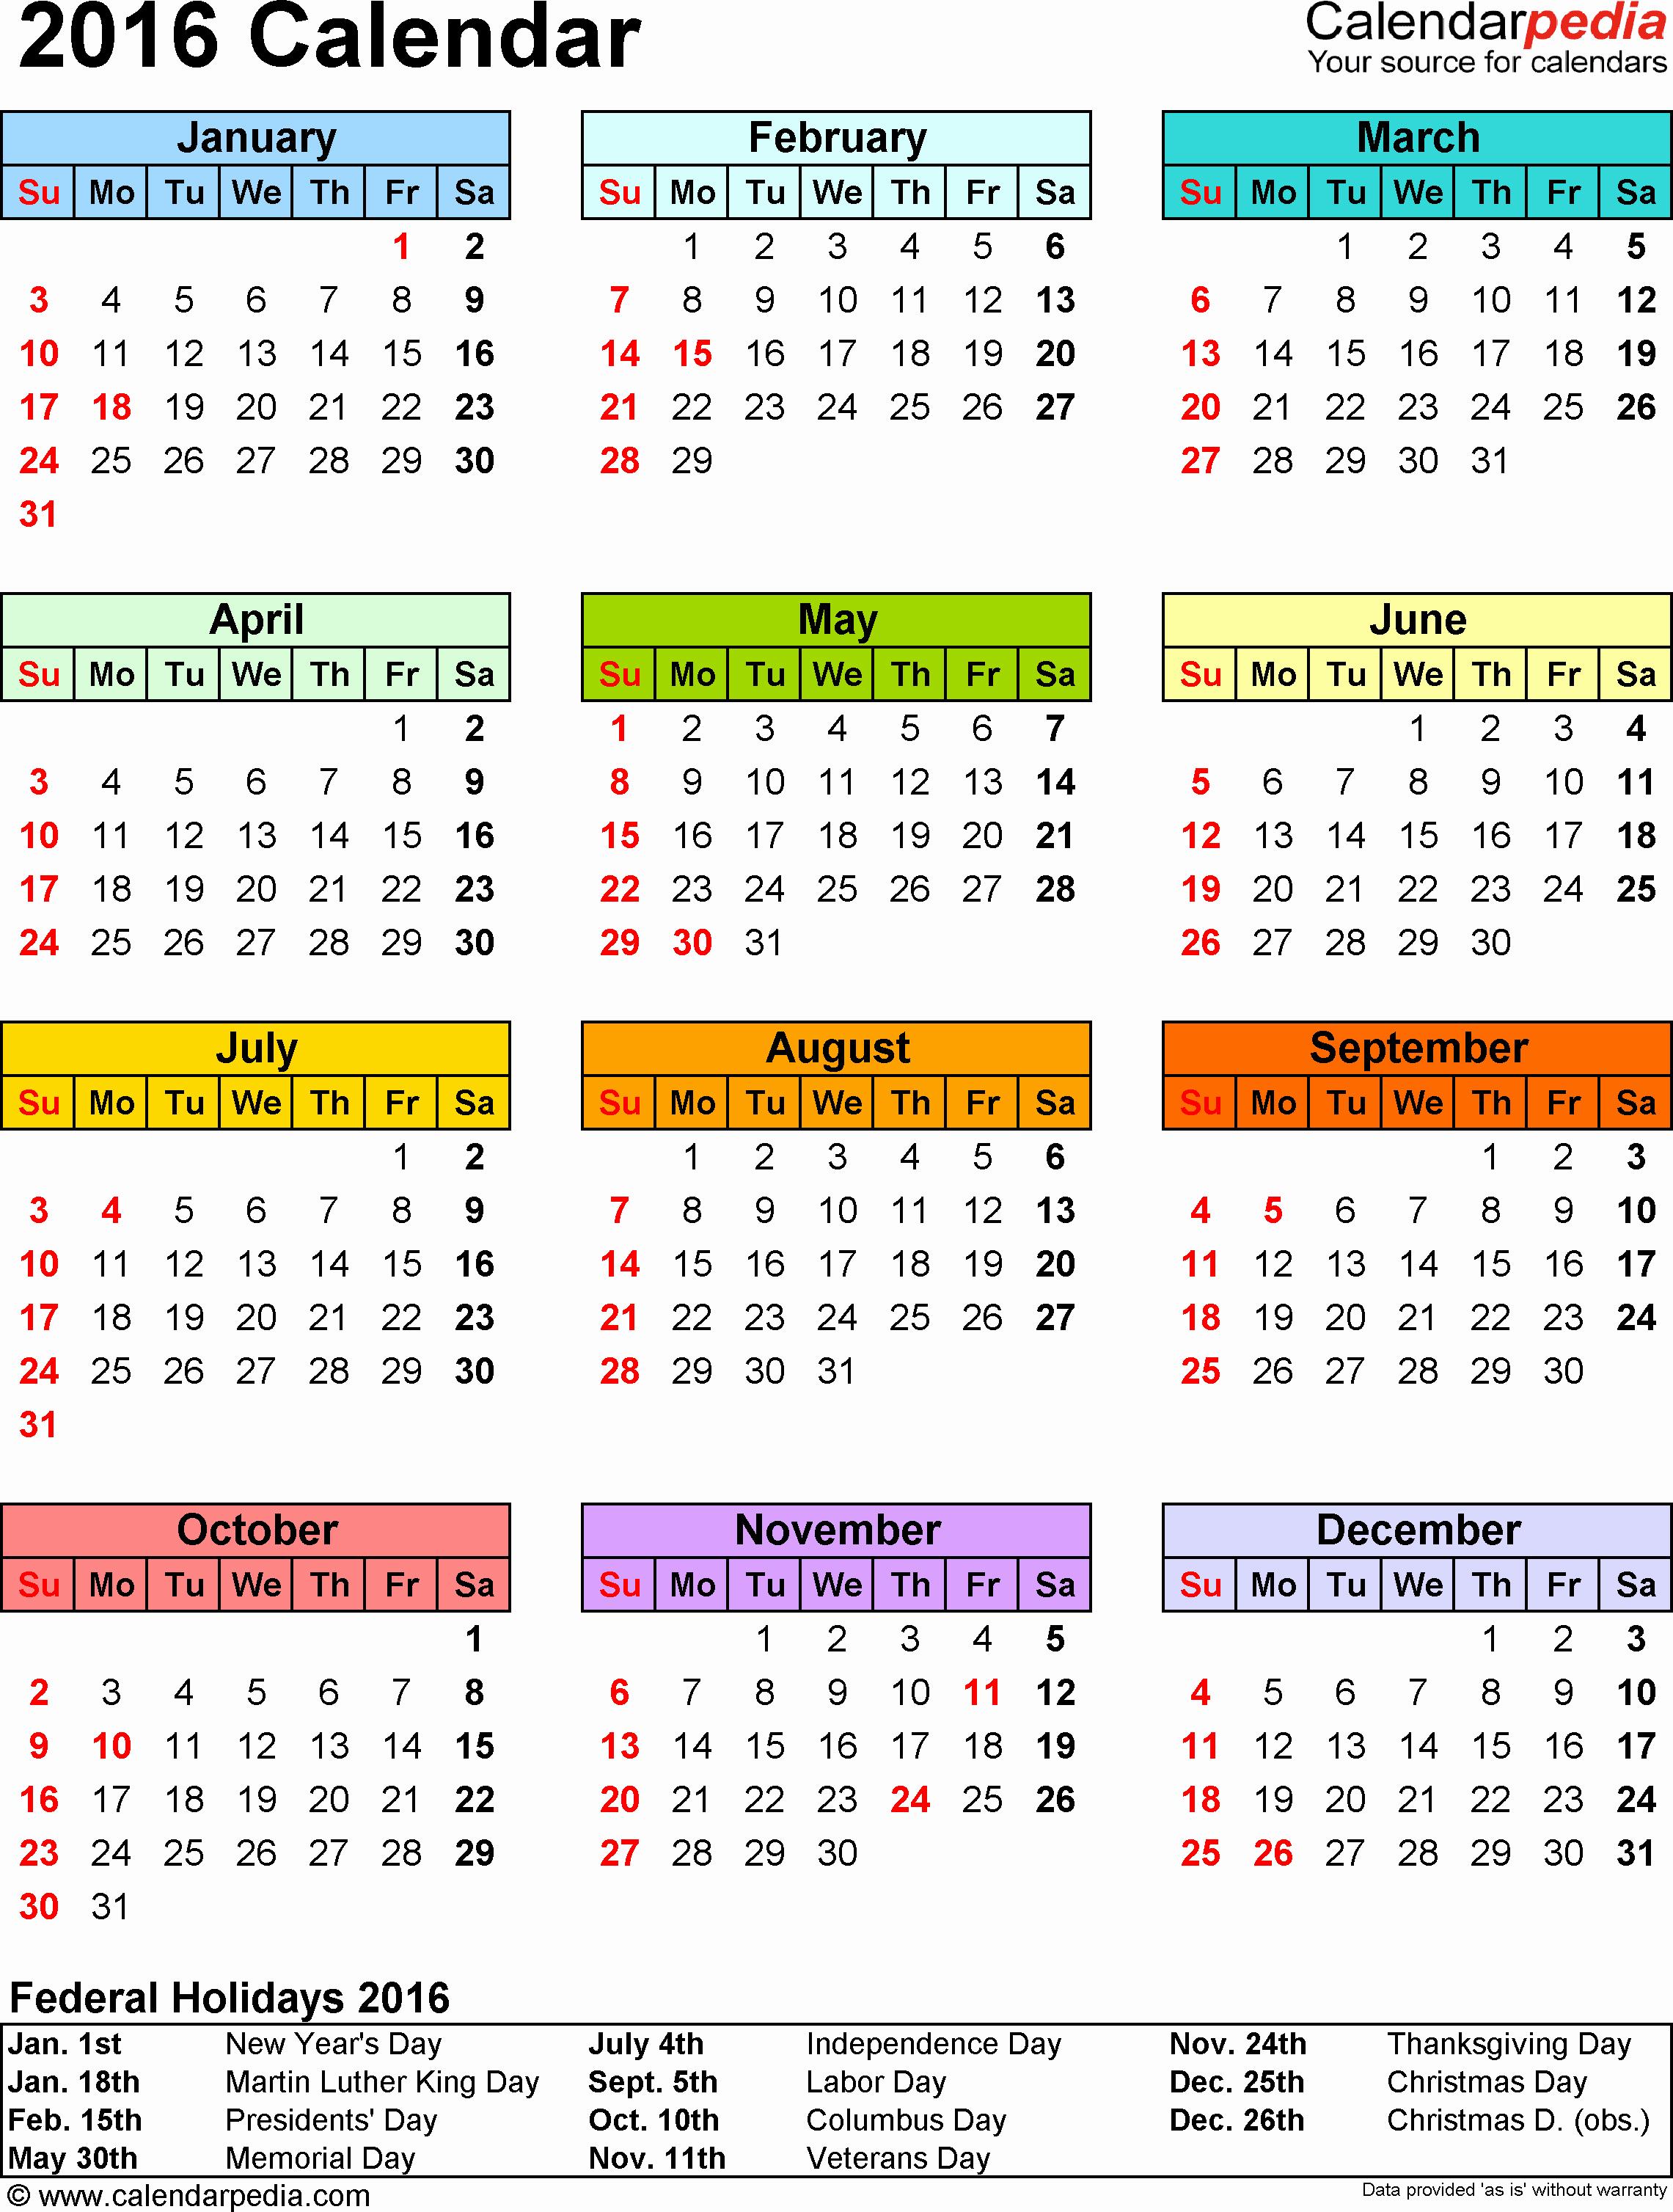 Payroll Calendar Template 2019 Inspirational 2019 Pay Period Calendar with Holidays